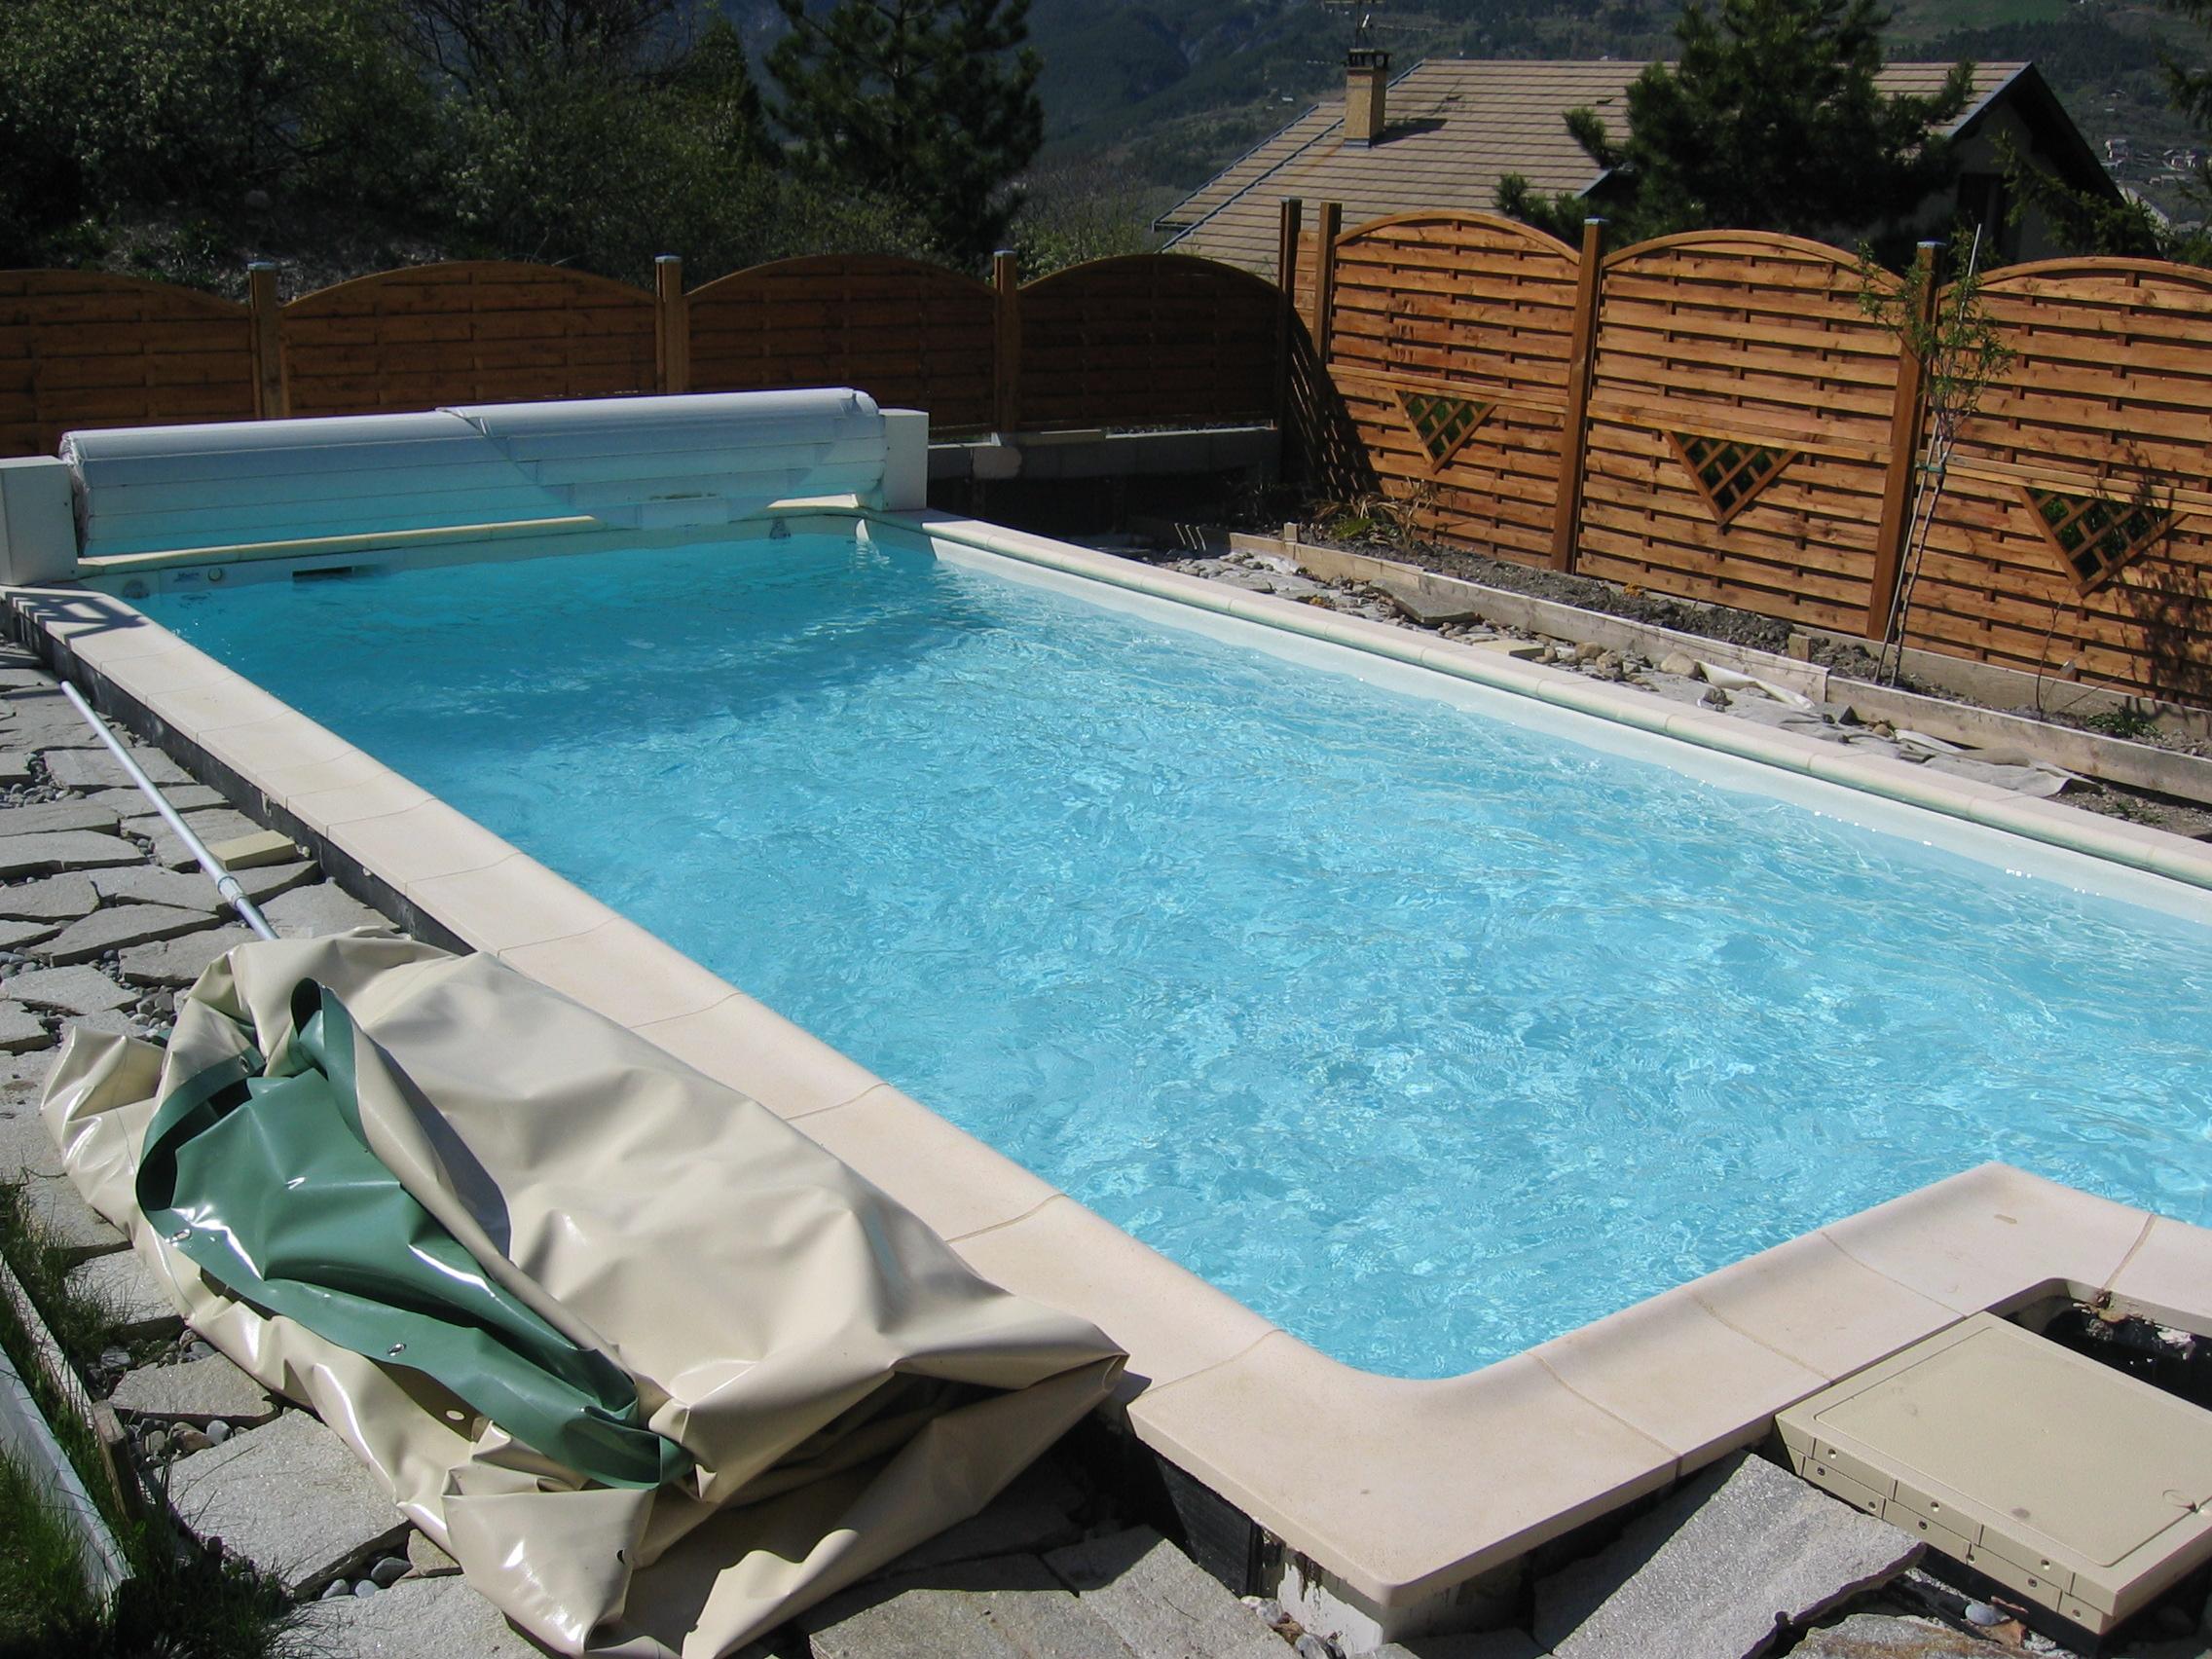 Volet roulant piscine hiver for Volet piscine desjoyaux